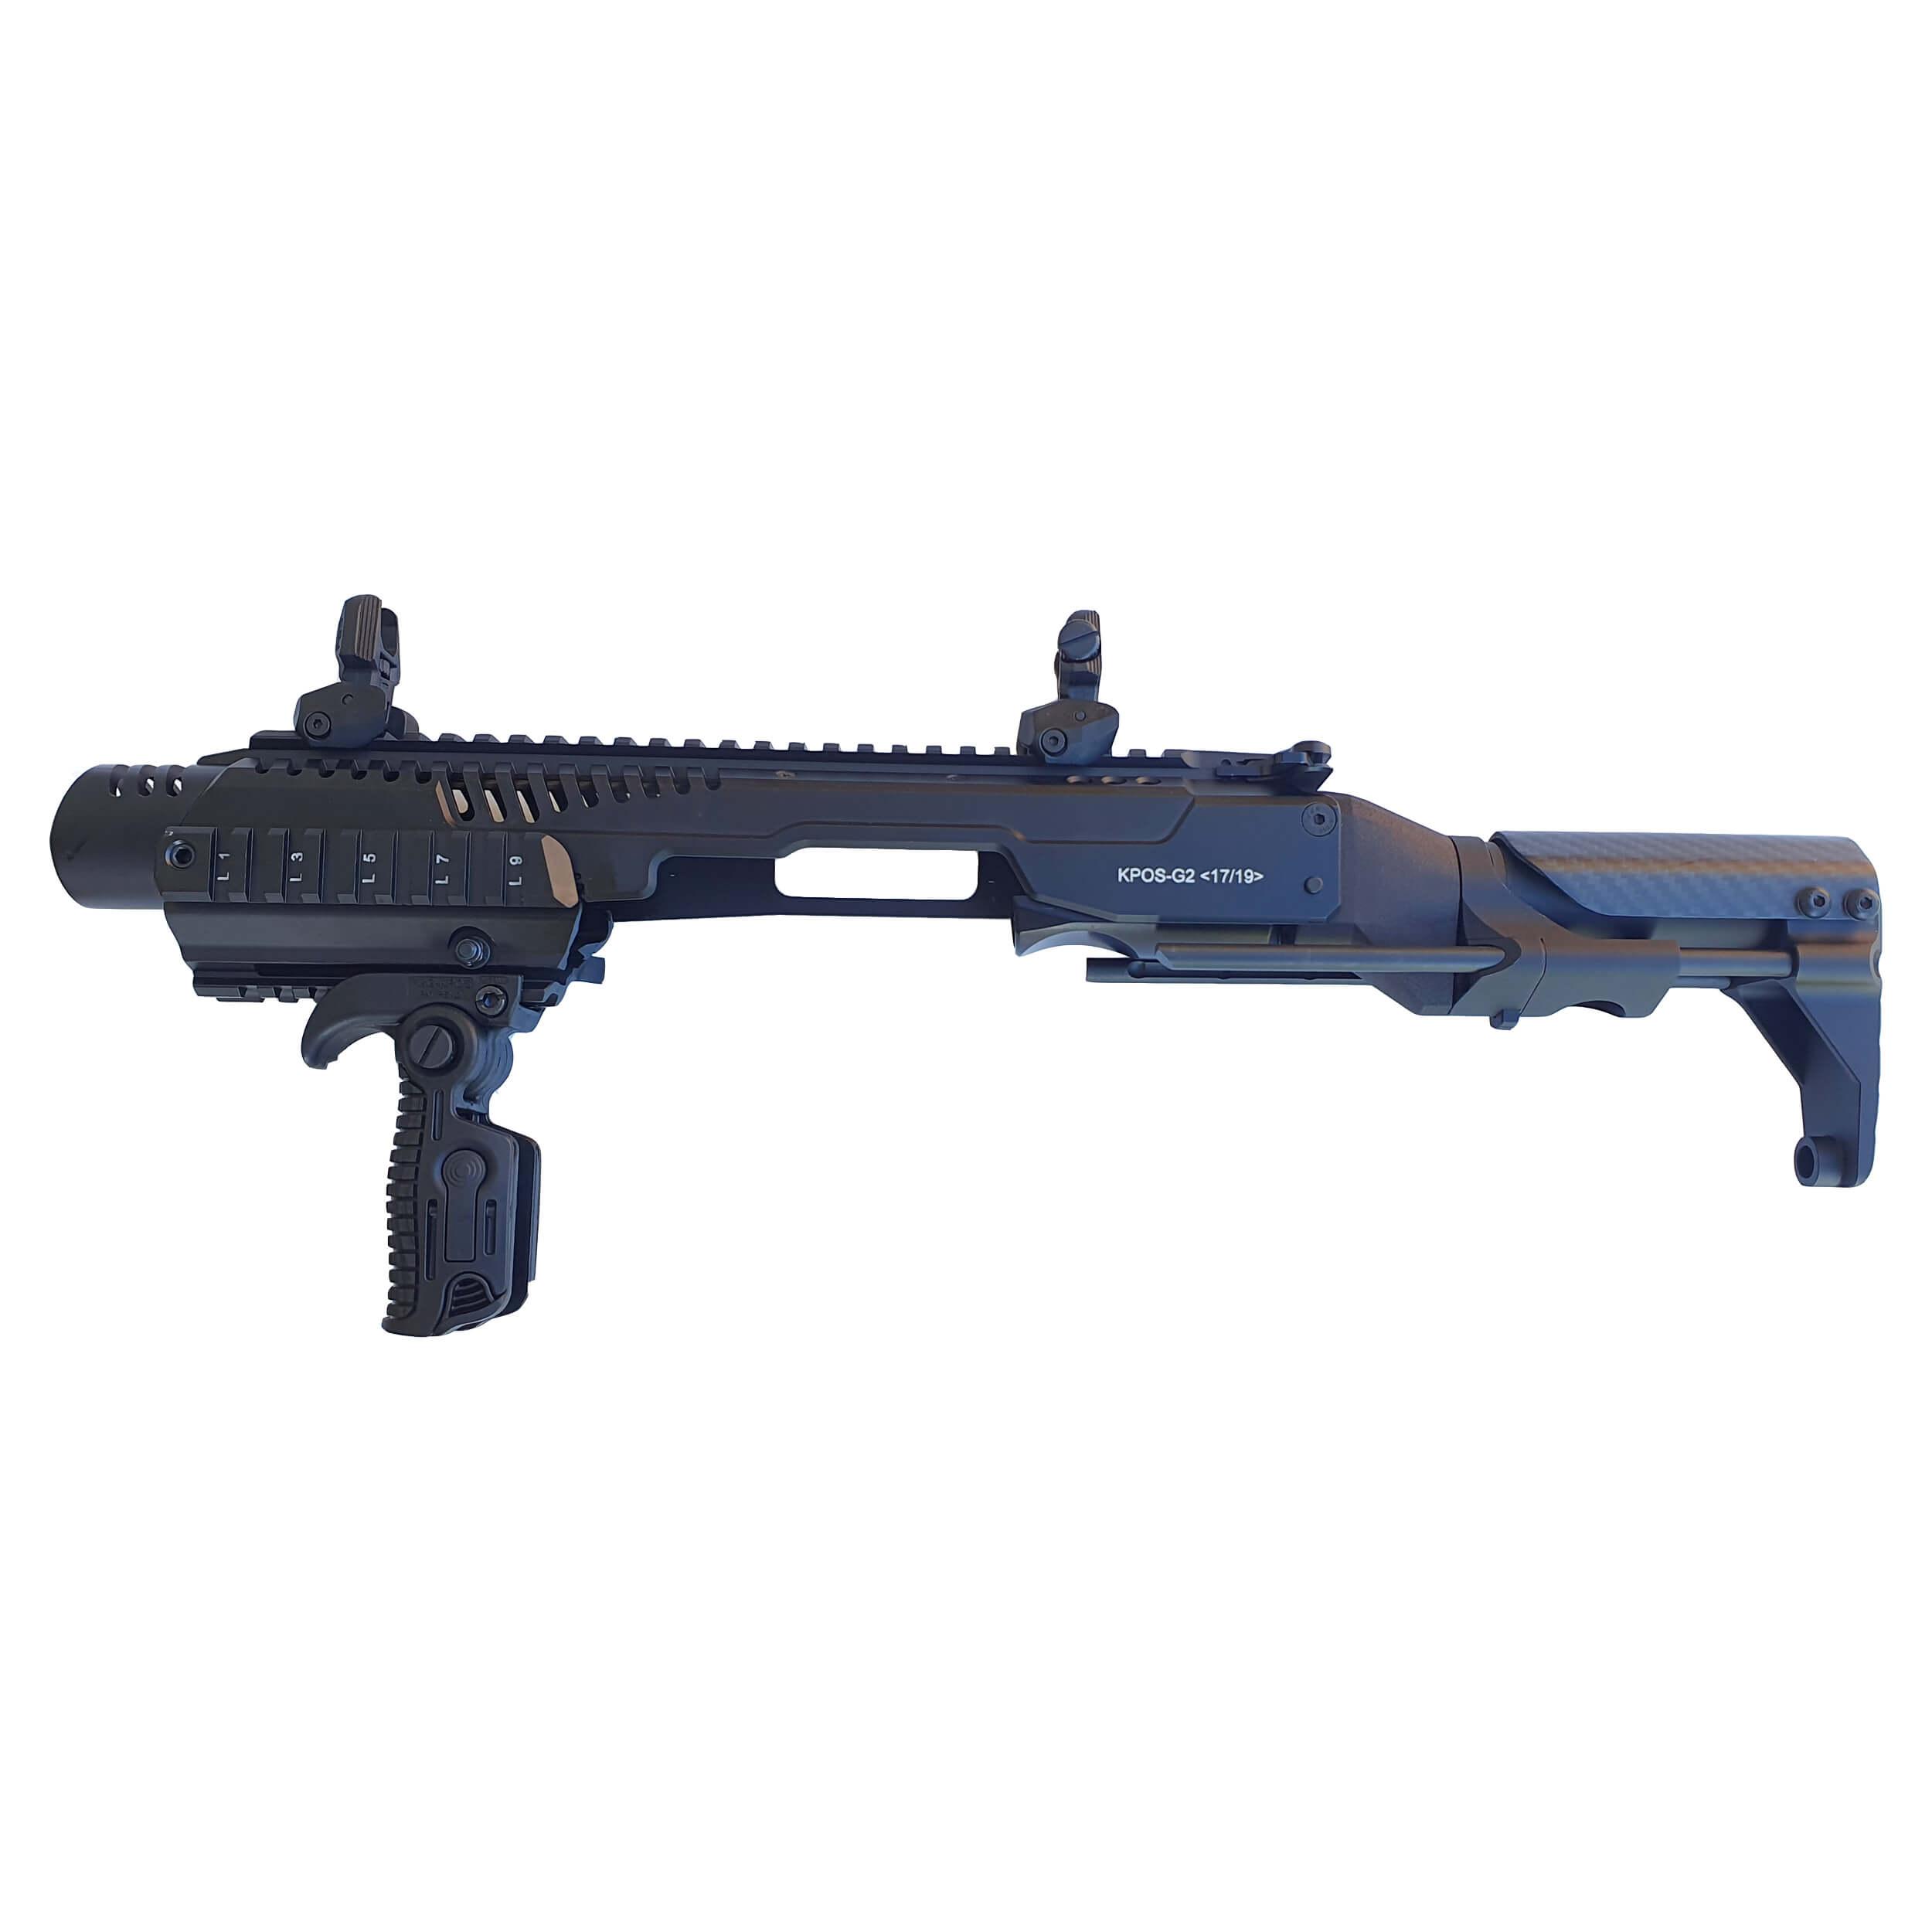 KPOS G2  PDW- Glock 17 /19